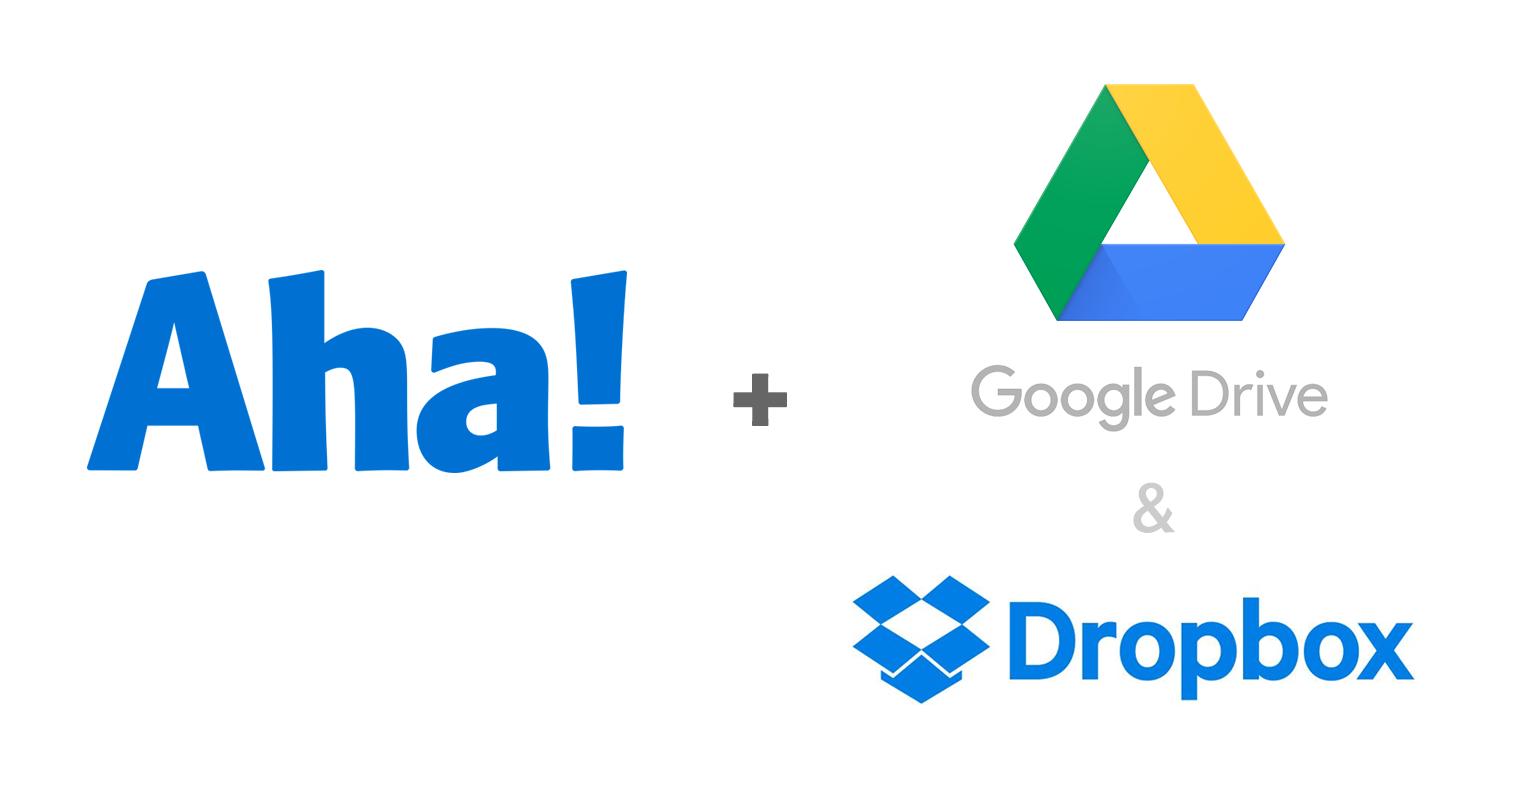 Aha, Google Drive, and Dropbox logos.